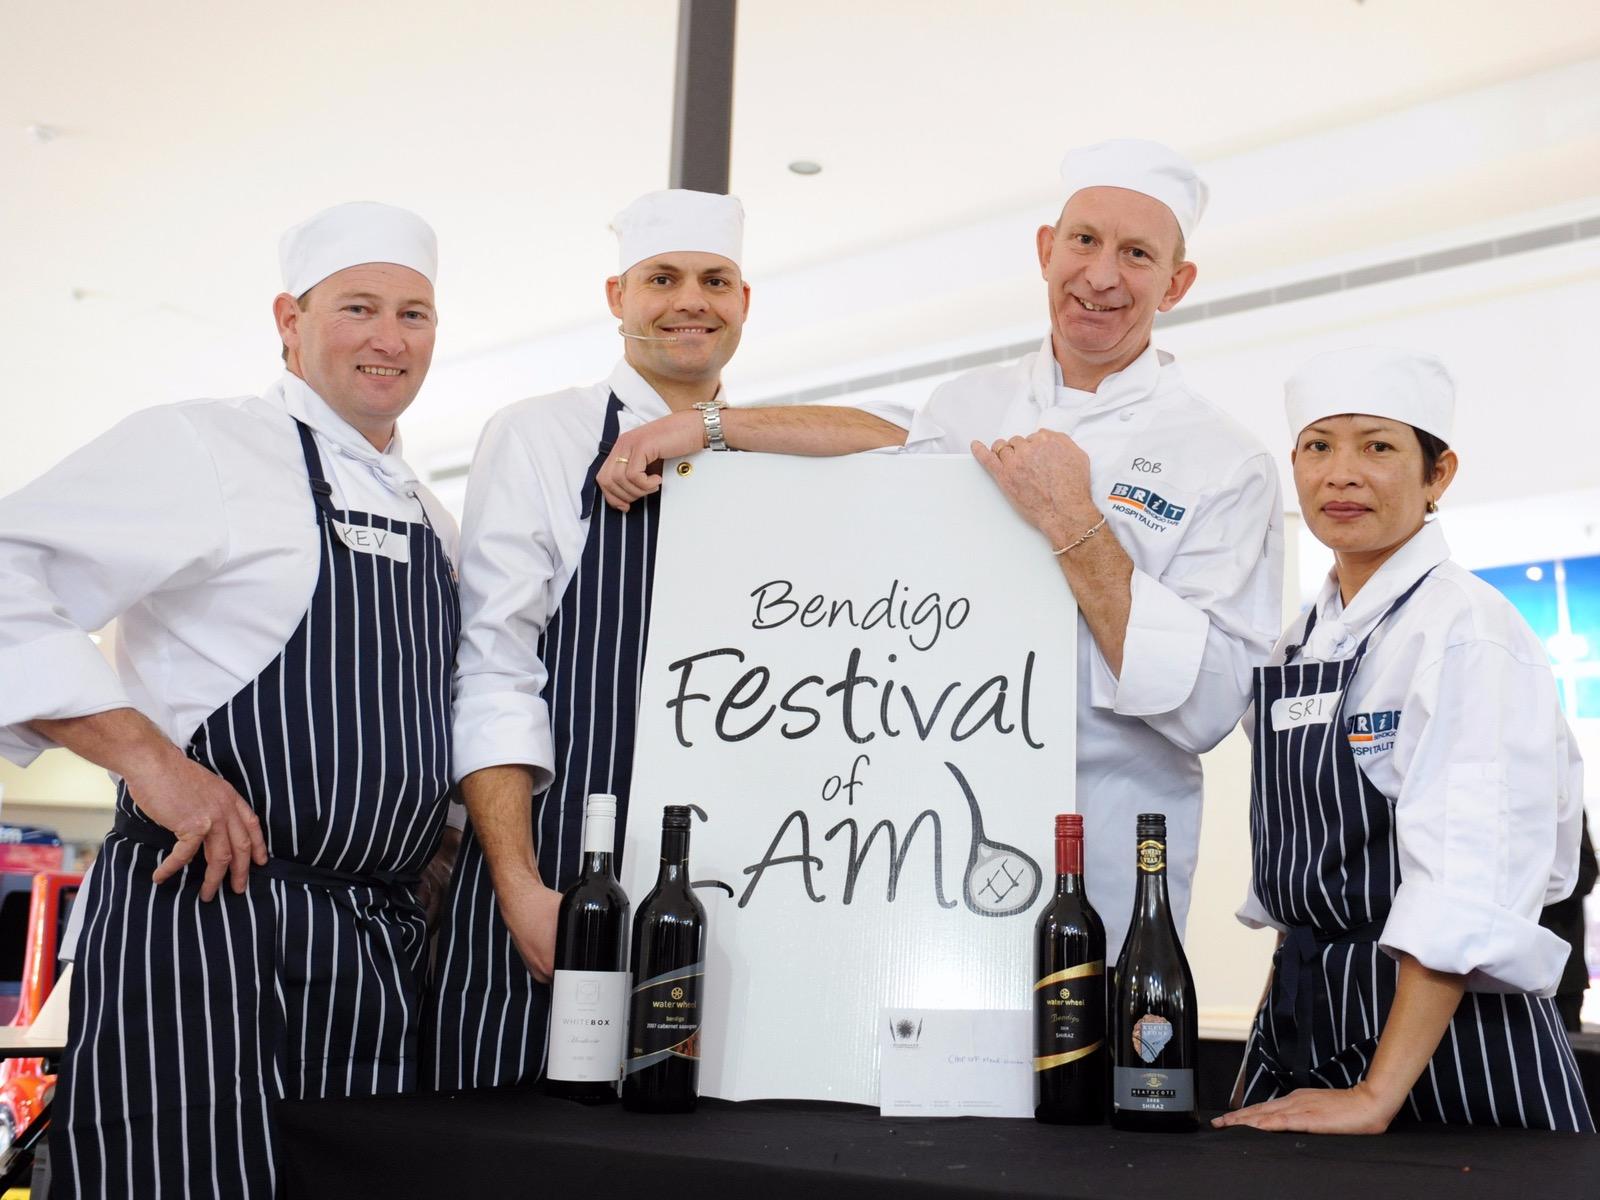 Festival of Lamb